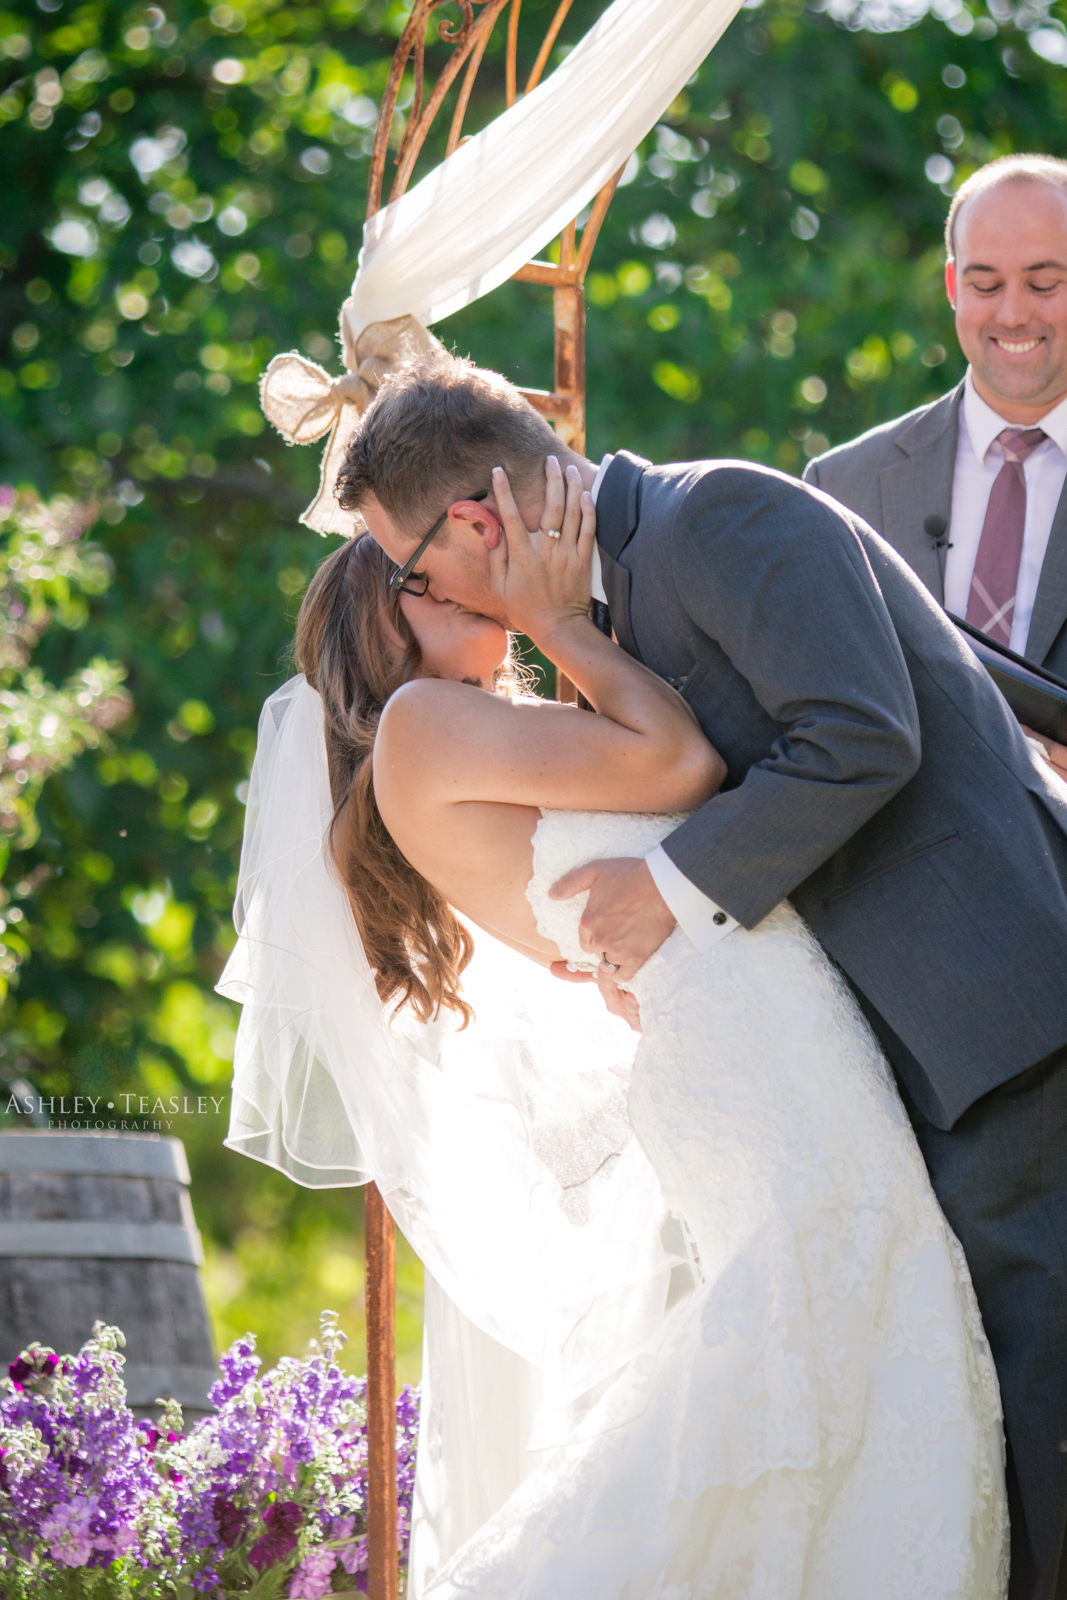 Ashley Teasley Photography - Amador Cellars Winery - Sacramento Wedding Photographer-126.JPG